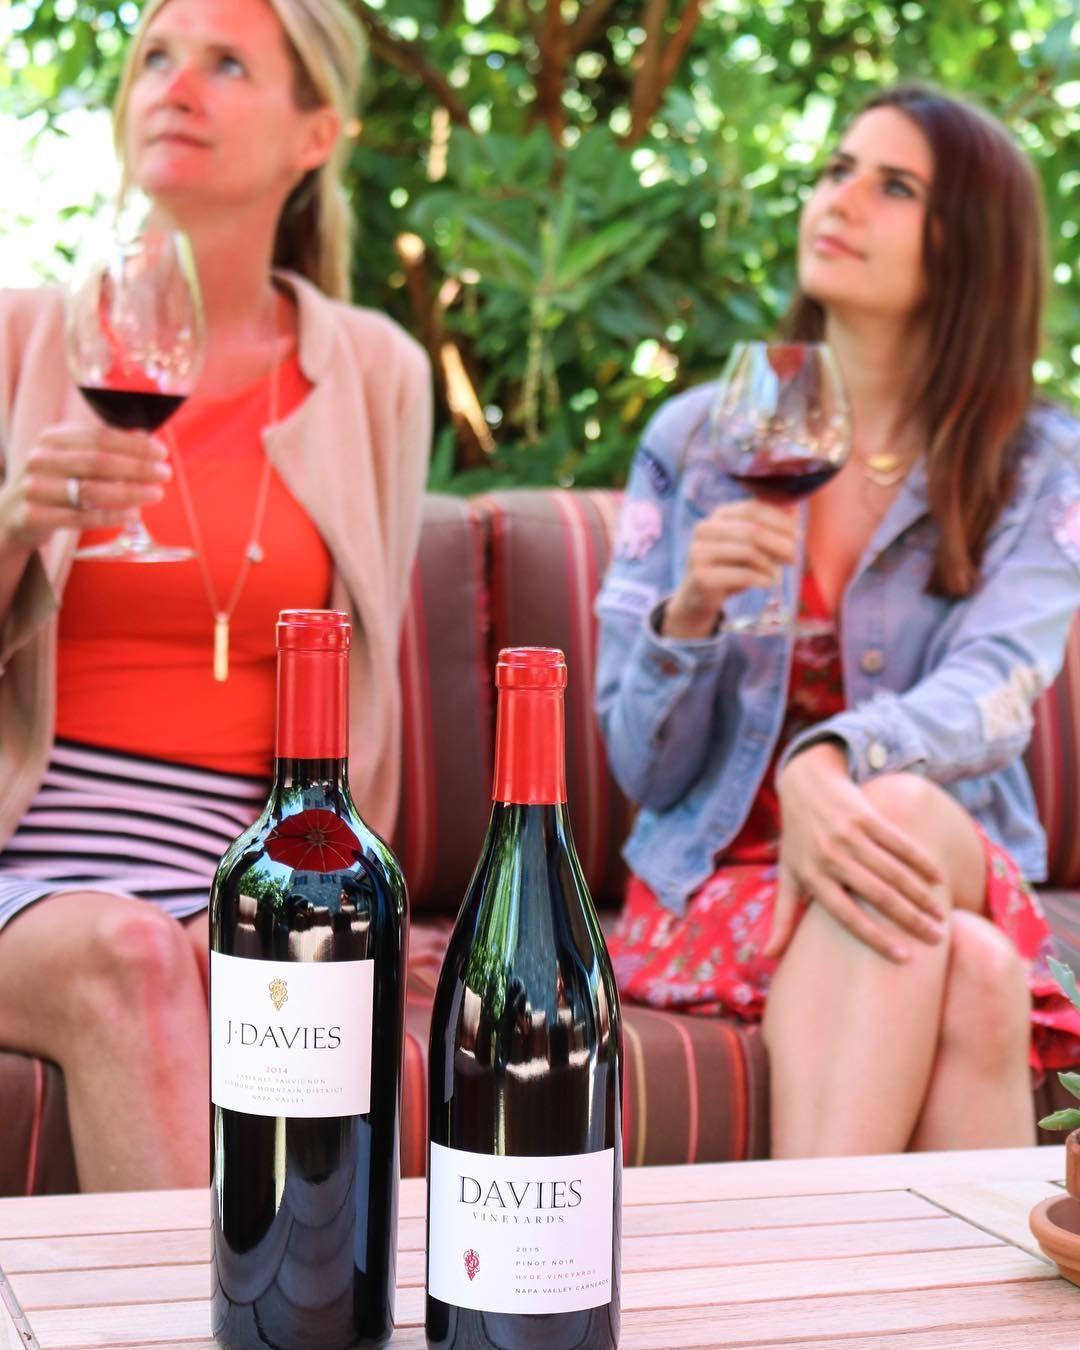 Davies Vineyards St Helena Ca What Rhymes Wine Recipes Wine Country